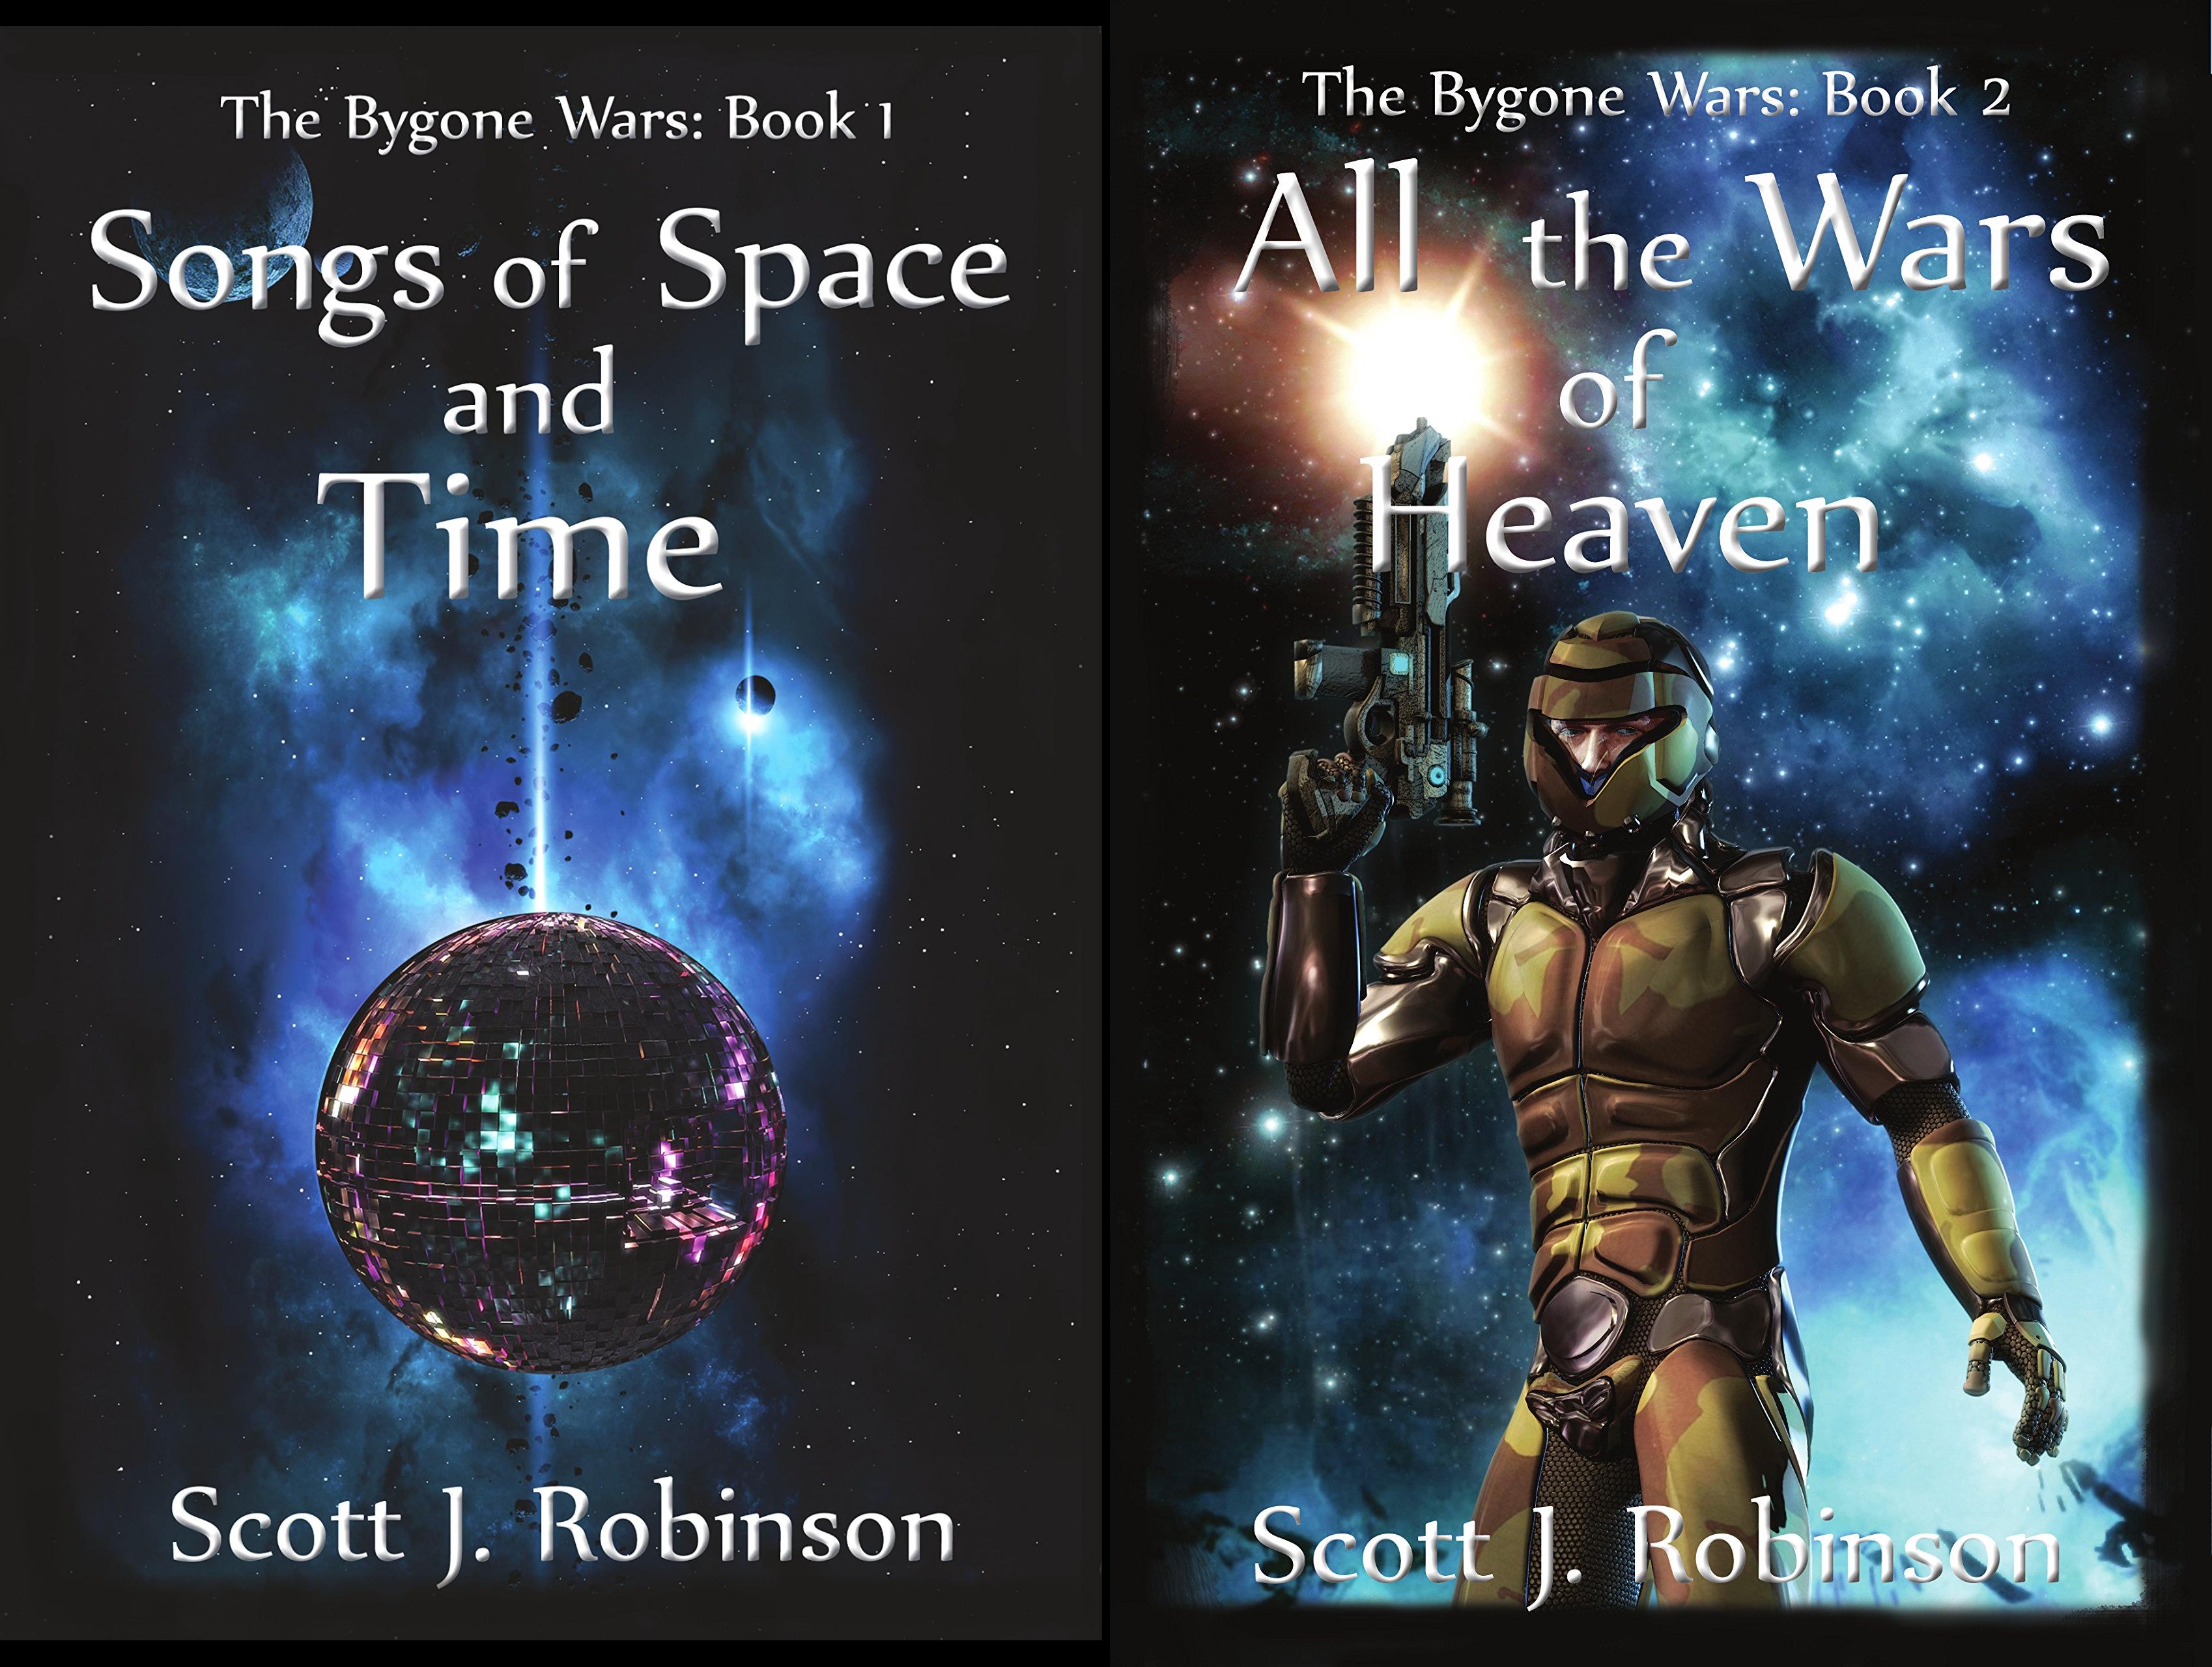 The Bygone Wars (2 Book Series)